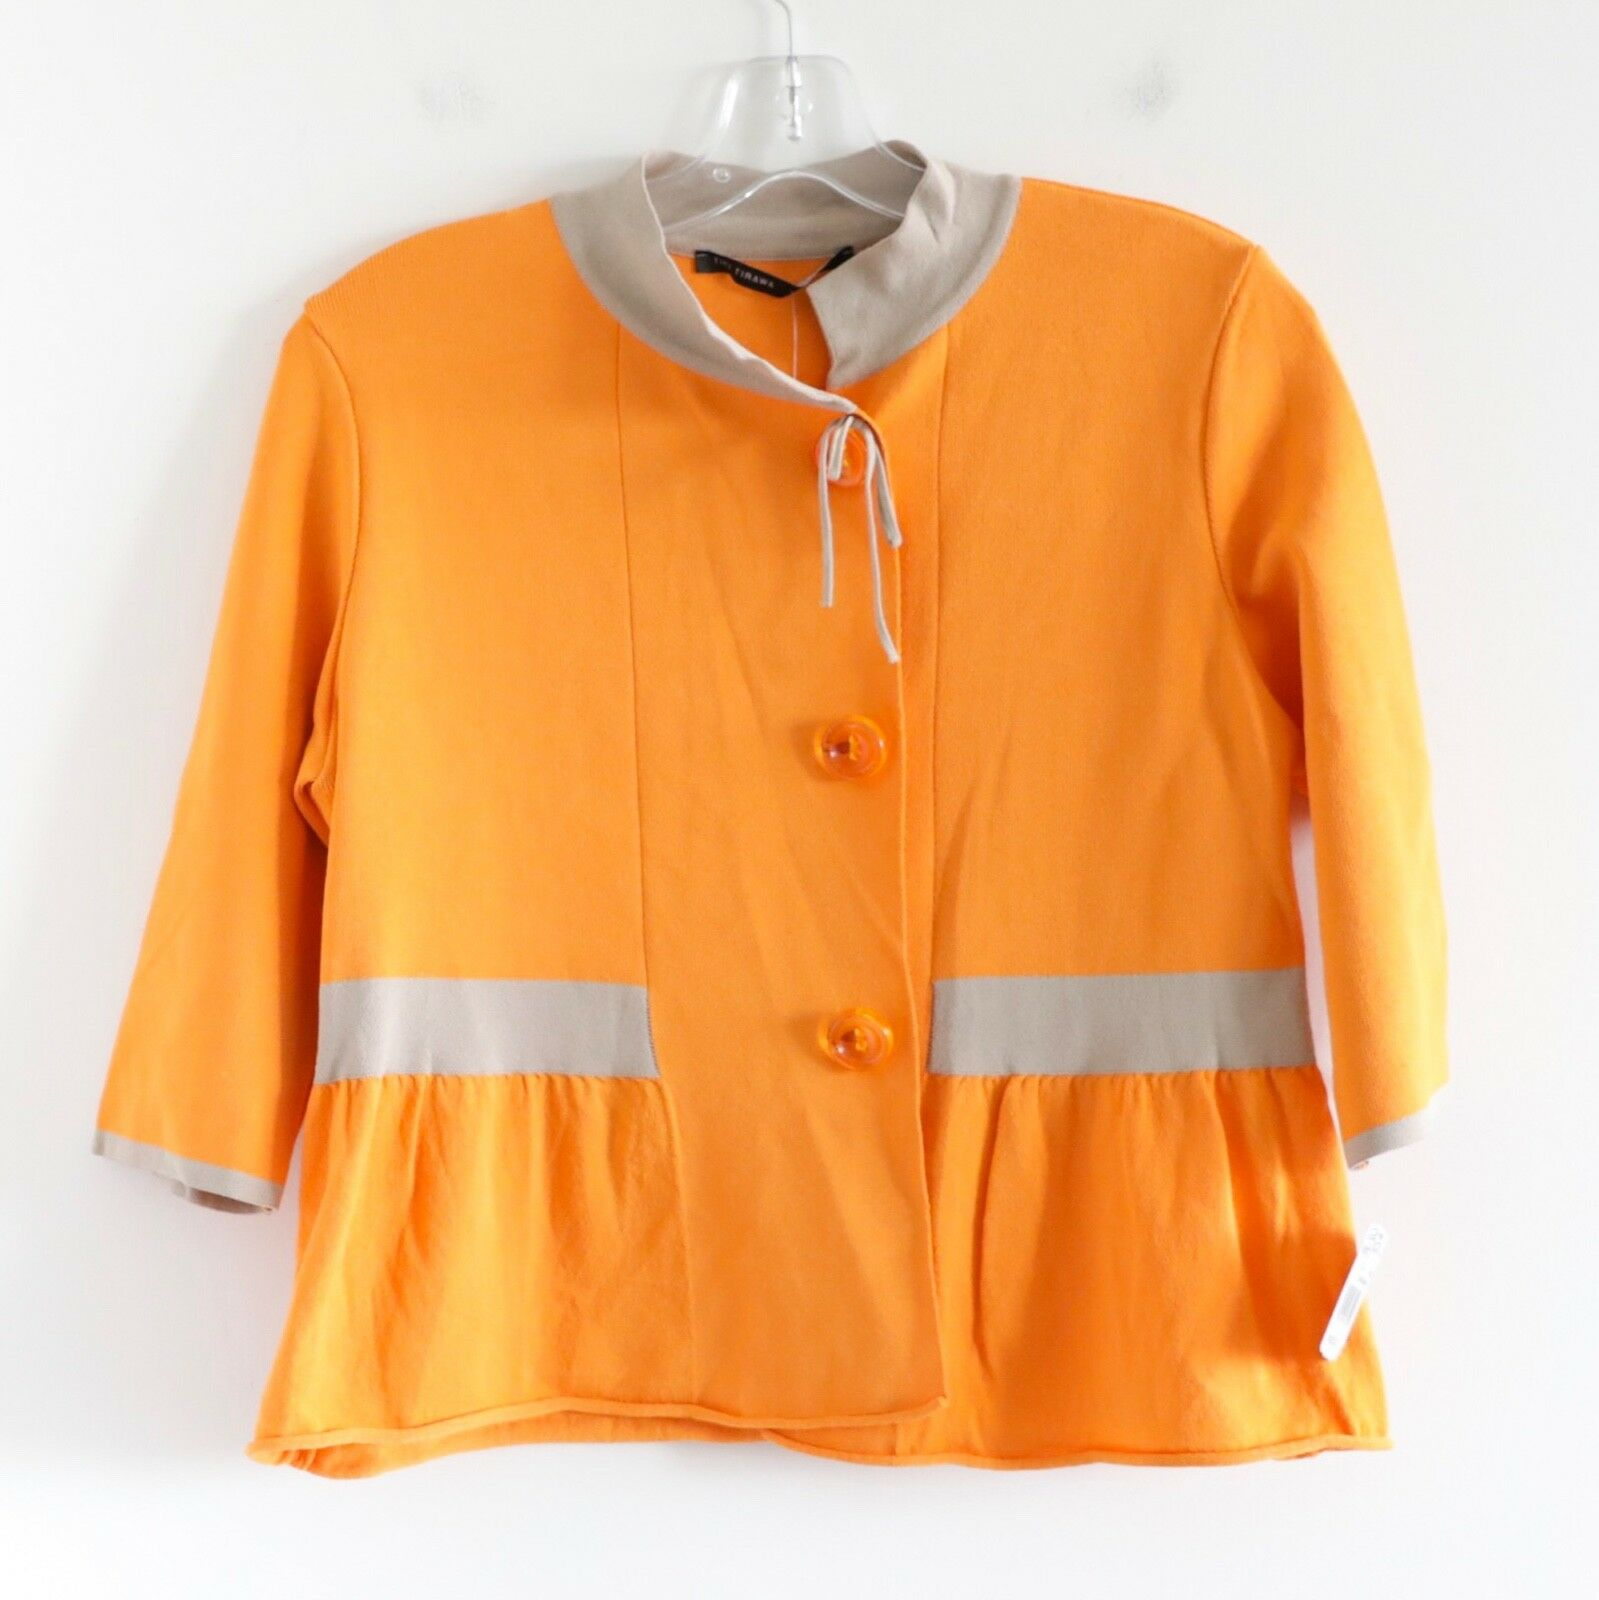 595  Tiki Tirawa NWT stickade bildigan tröja orange Top Storlek L stor Frankrike 3  4